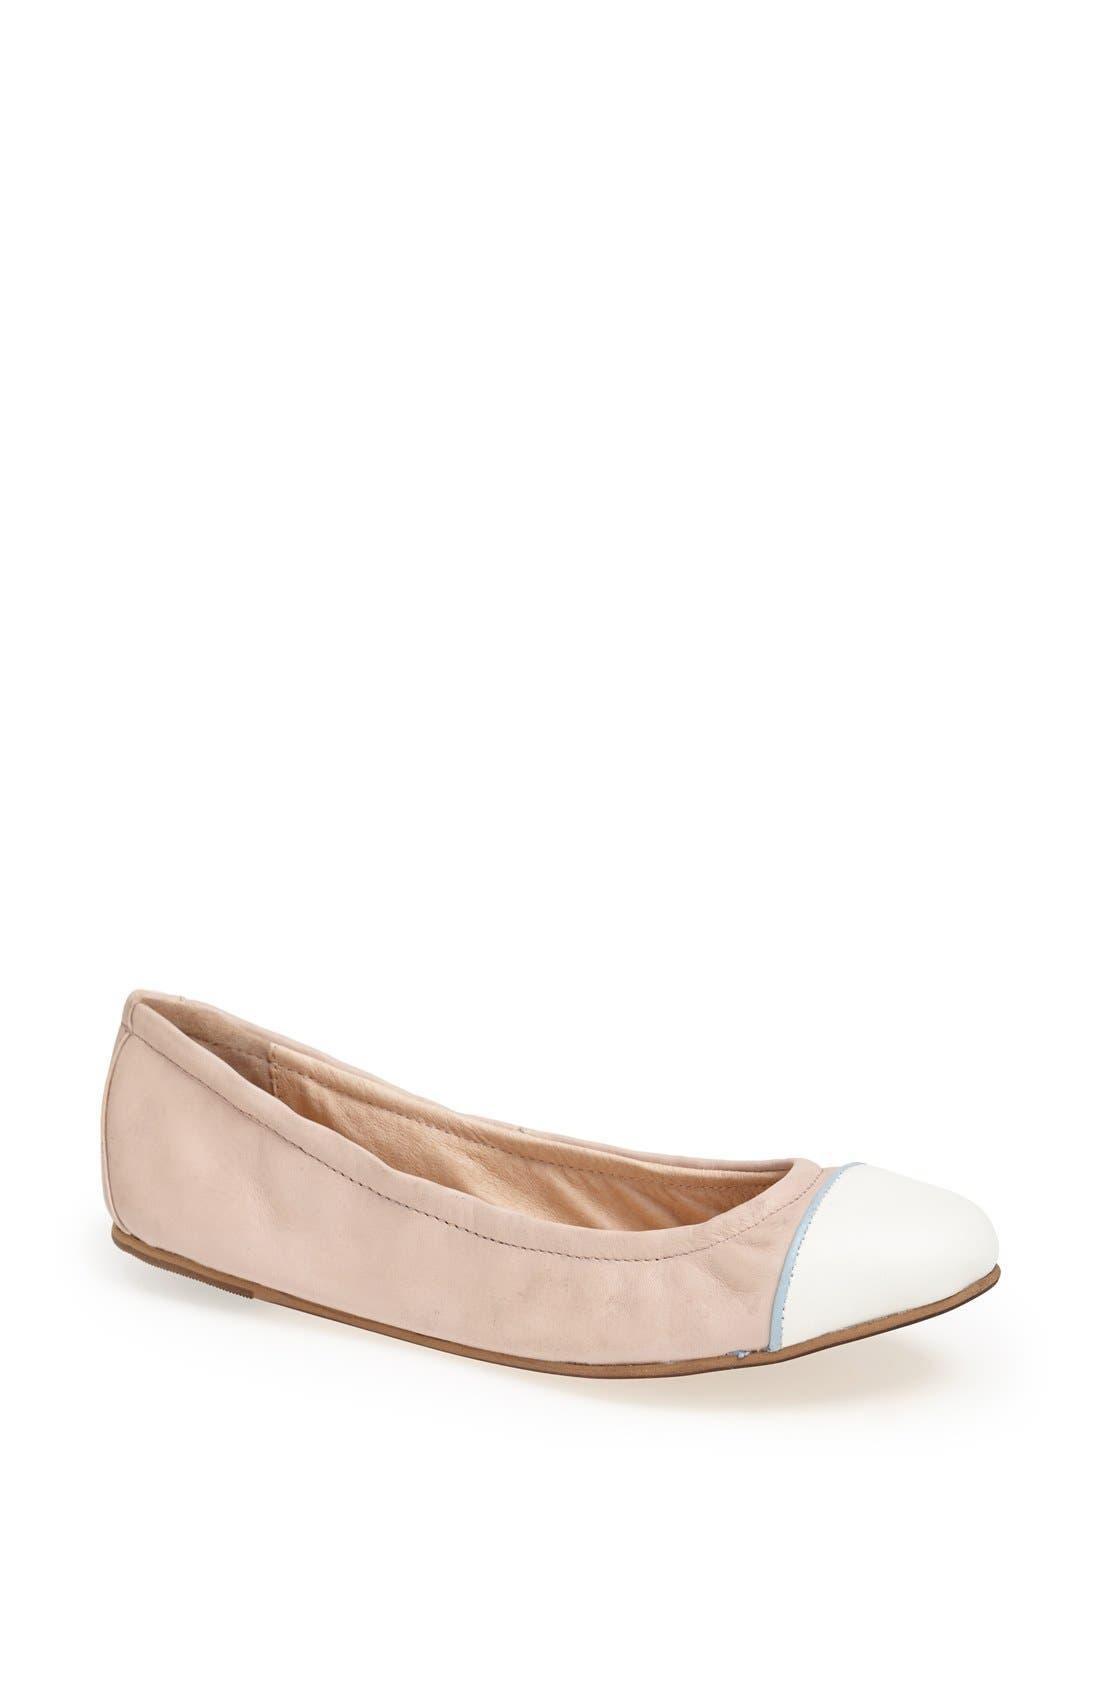 Alternate Image 1 Selected - Yosi Samra 'Marni' Foldable Ballet Flat